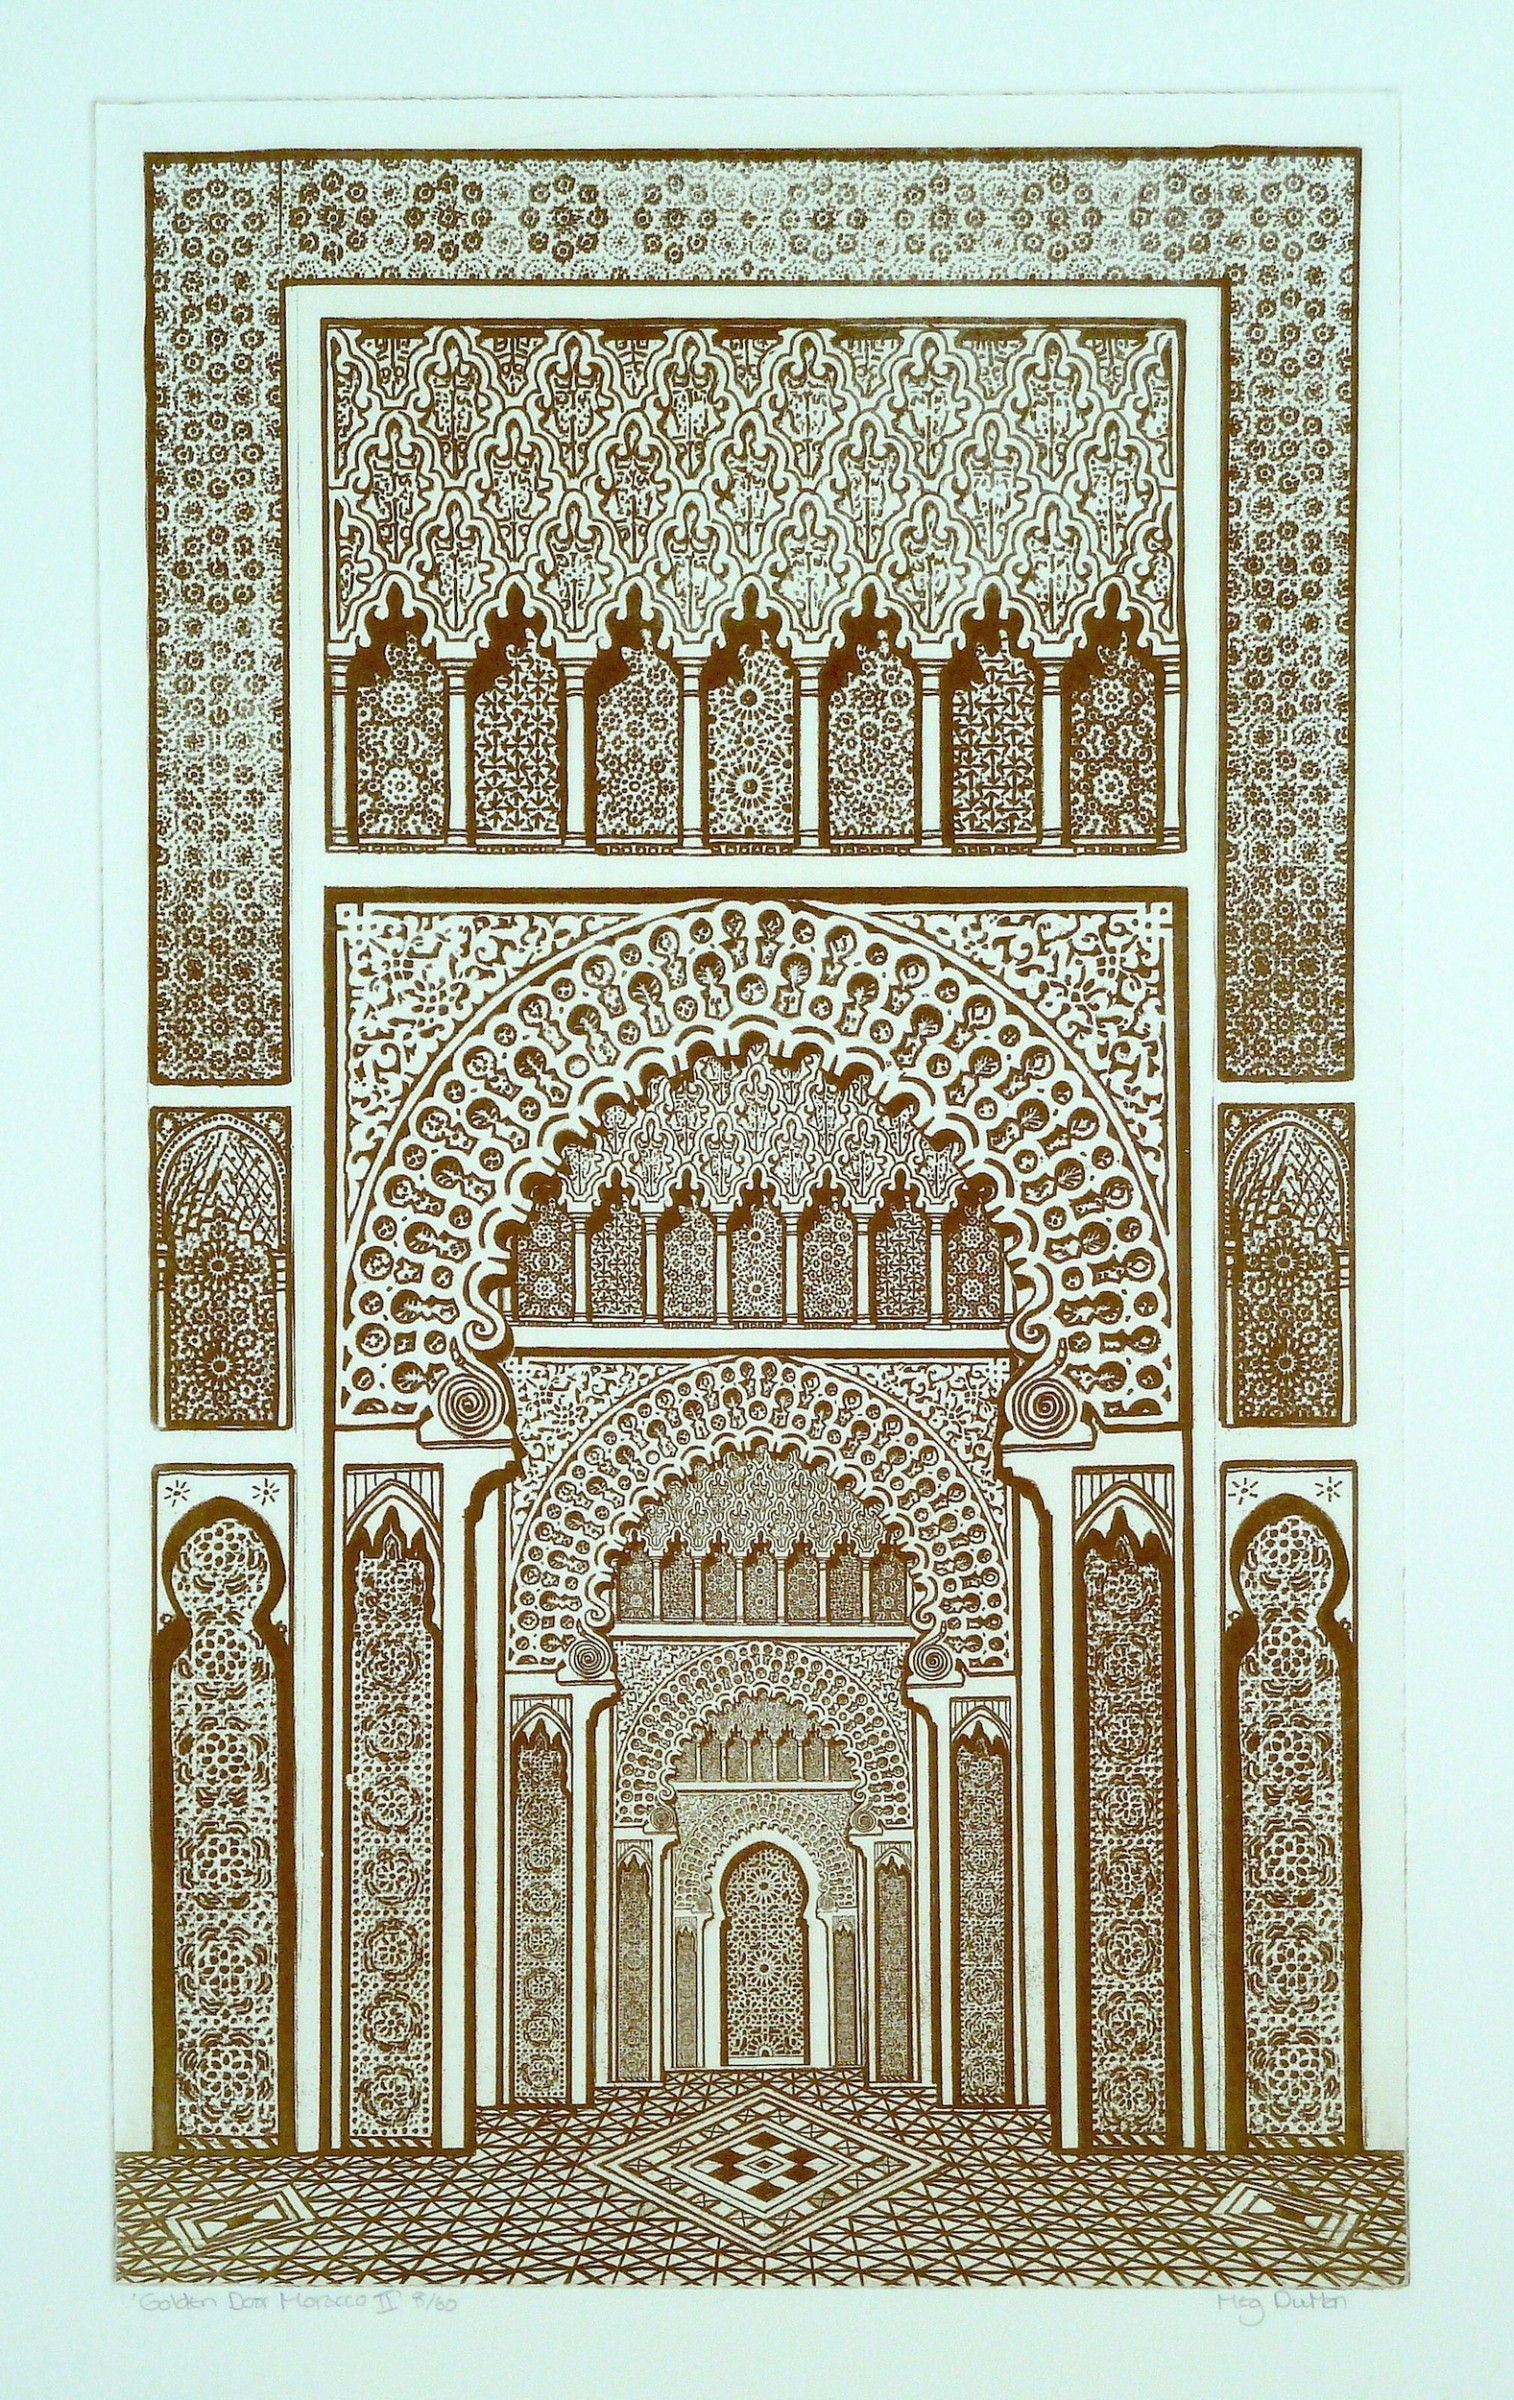 "<span class=""link fancybox-details-link""><a href=""/exhibitions/24/works/artworks_standalone11359/"">View Detail Page</a></span><div class=""artist""><span class=""artist""><strong>Meg Dutton RE</strong></span></div><div class=""title""><em>Golden Door Morocco 2</em></div><div class=""medium"">etching and watercolour</div><div class=""dimensions"">69 x 49 cm framed<br>49 x 29 cm image size</div><div class=""edition_details"">edition of 60</div>"